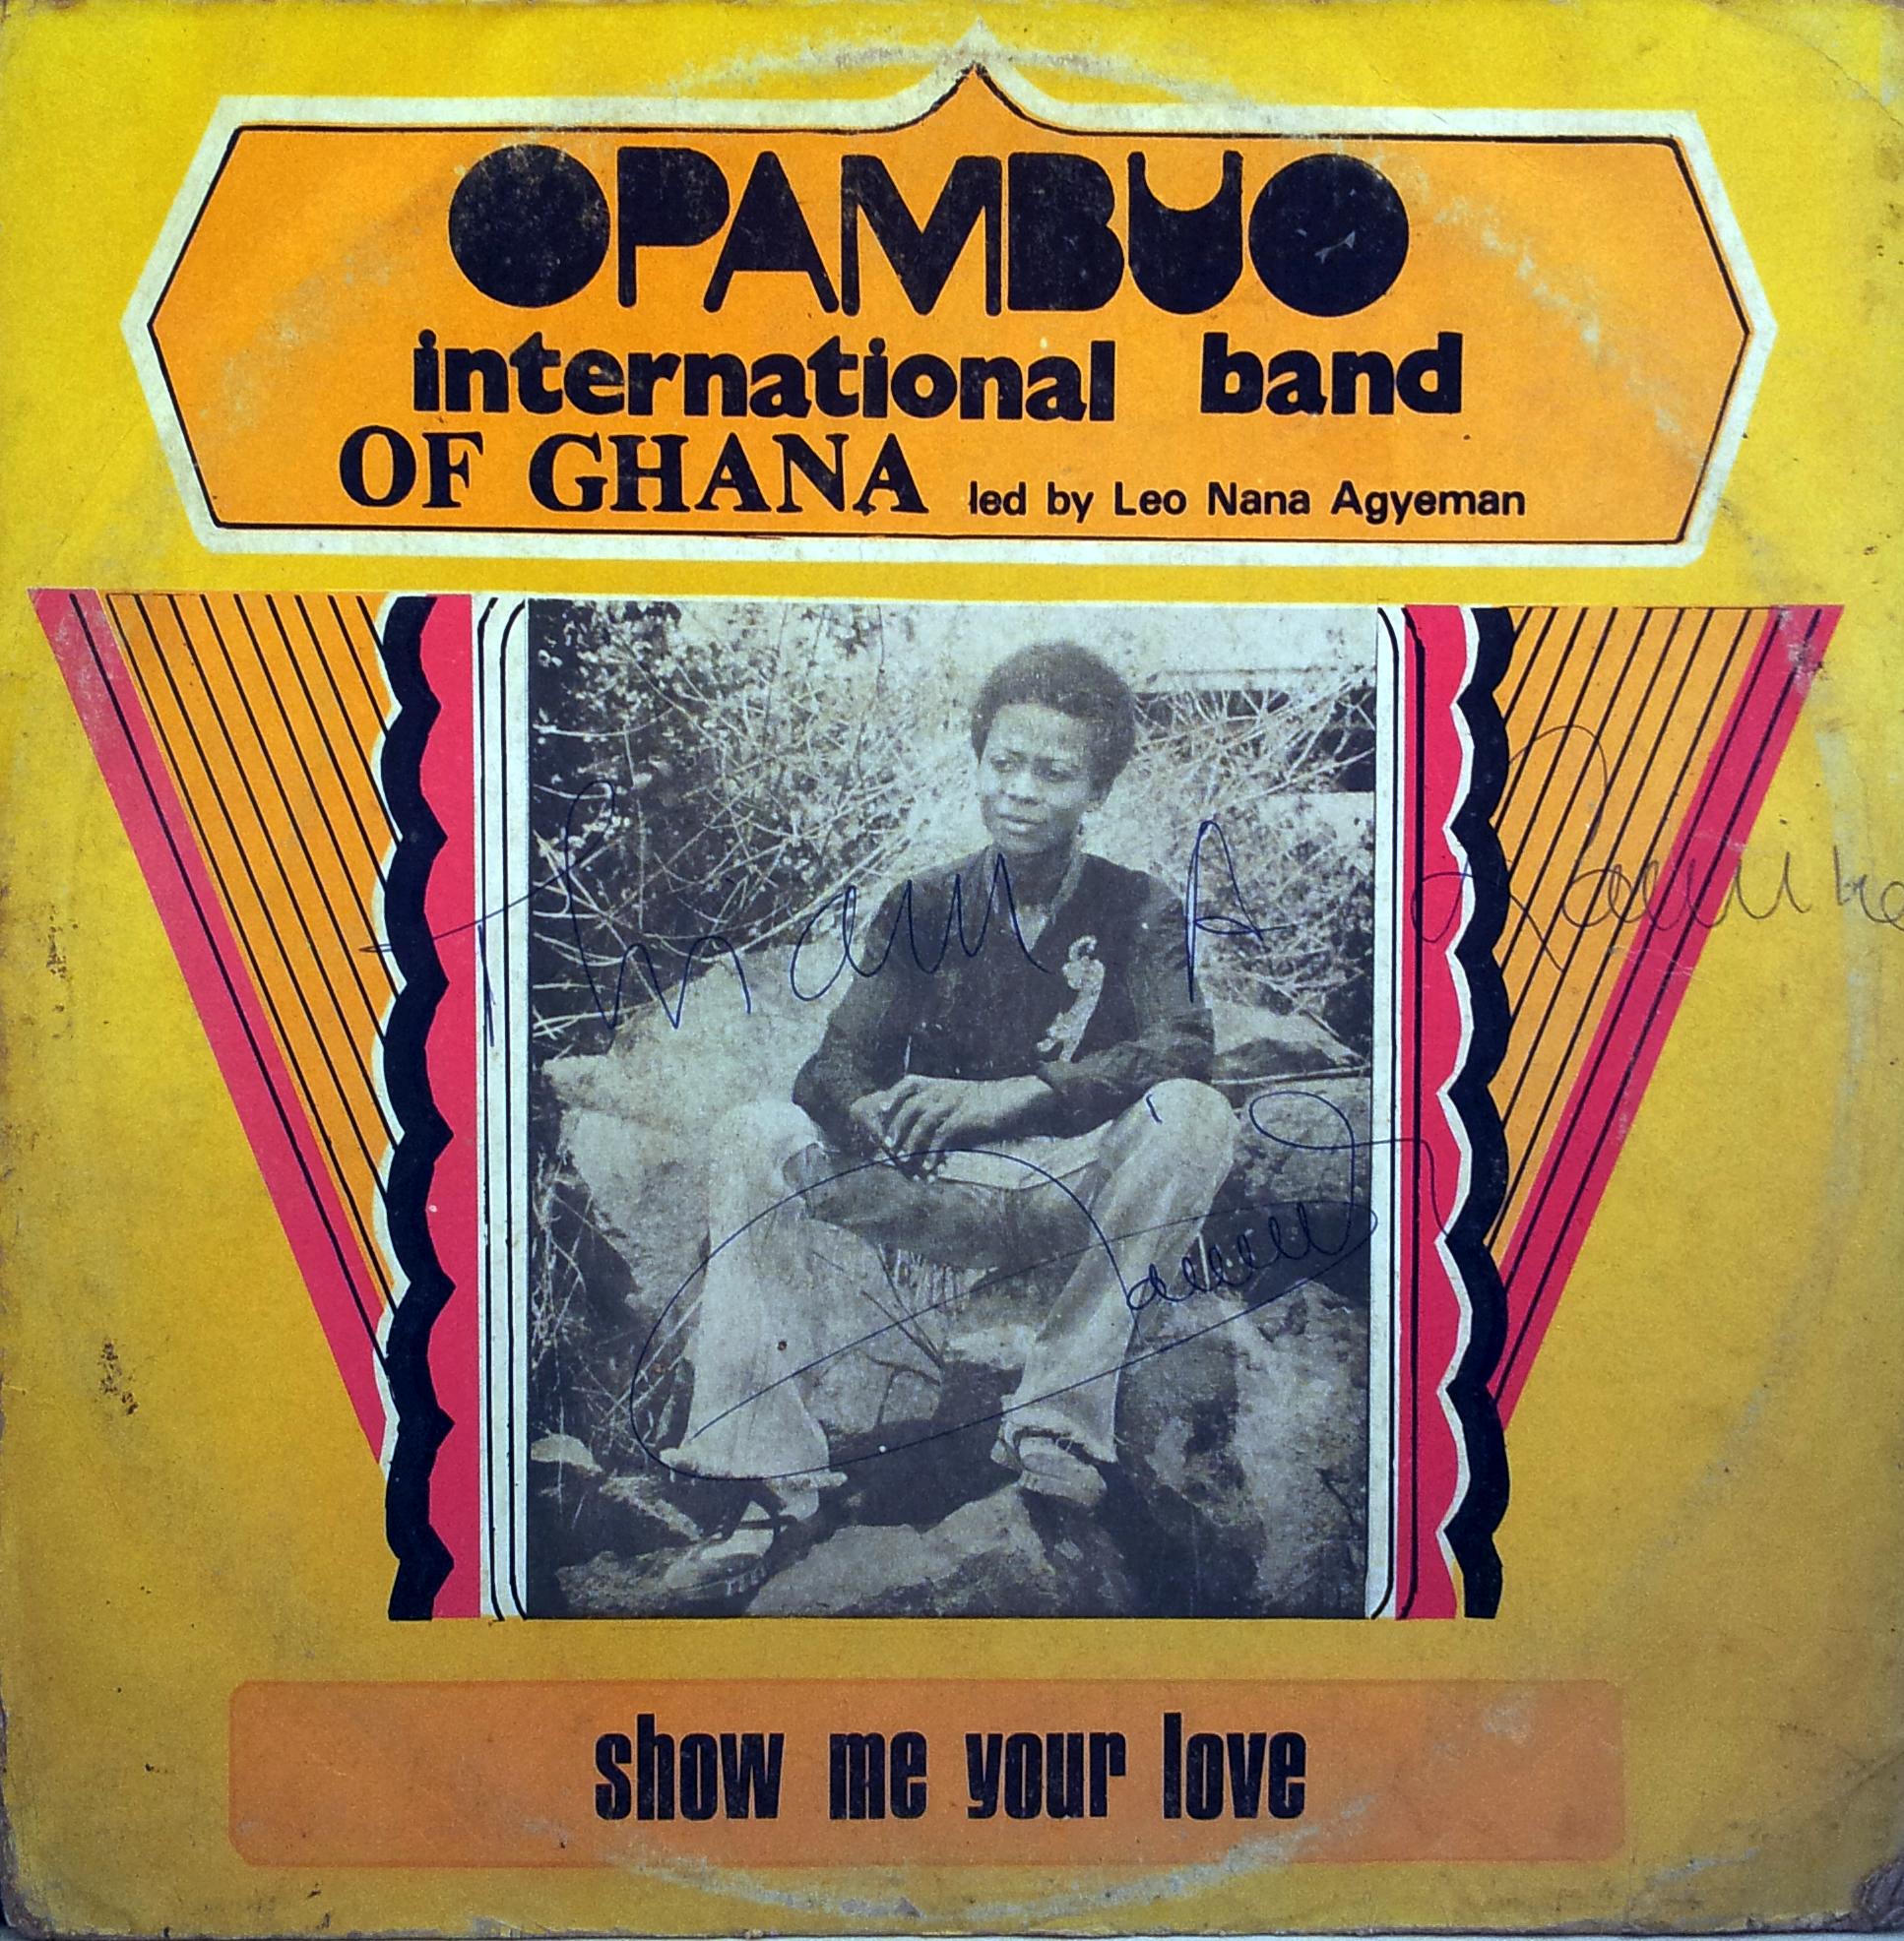 Opambuo International Band Of Ghana Show Me Your Love